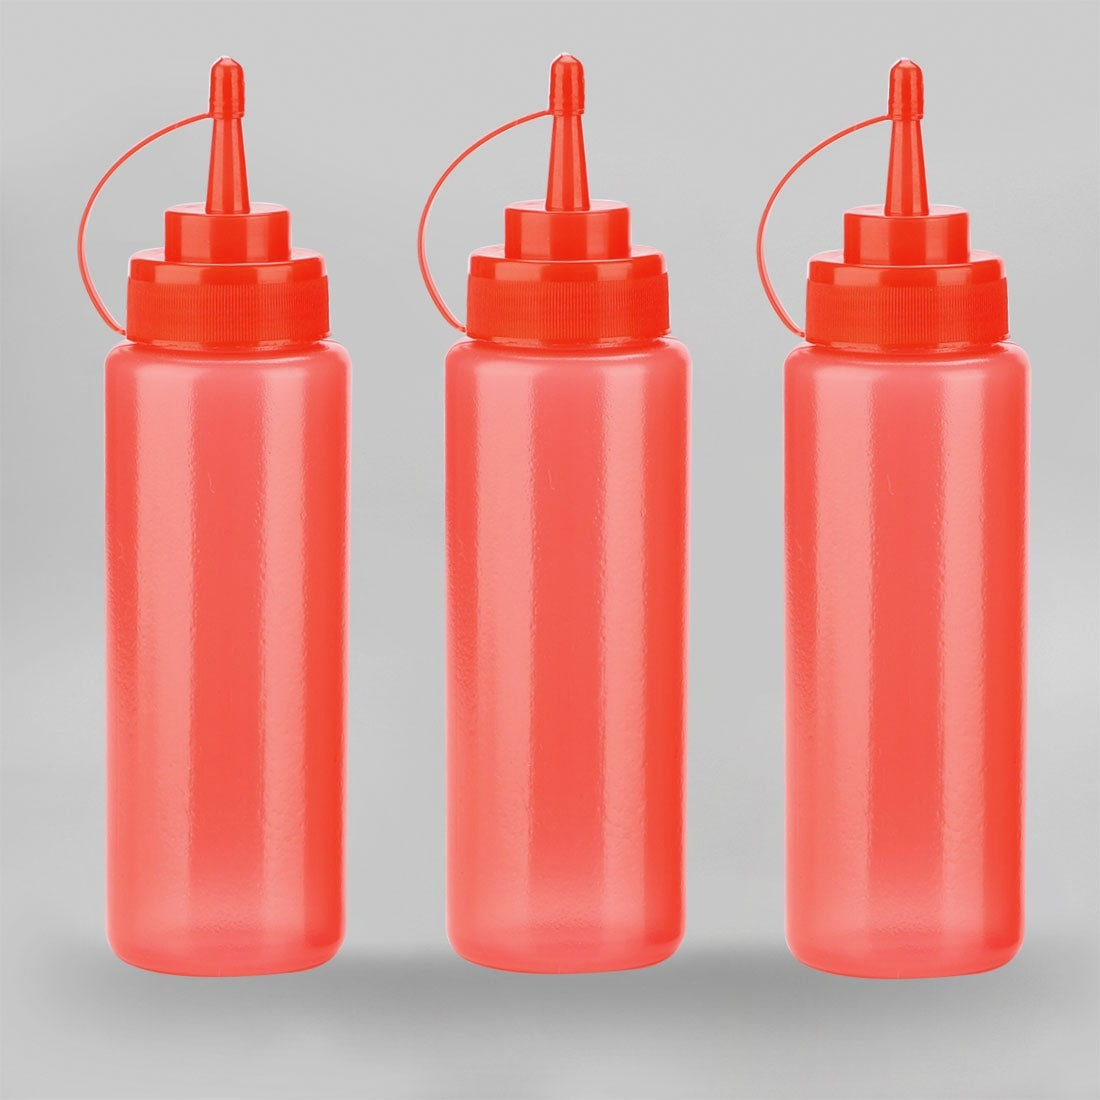 24oz - 700ml 3 Hole Sauce Squeeze Condiment Bottles Dispenser Kitchen /&